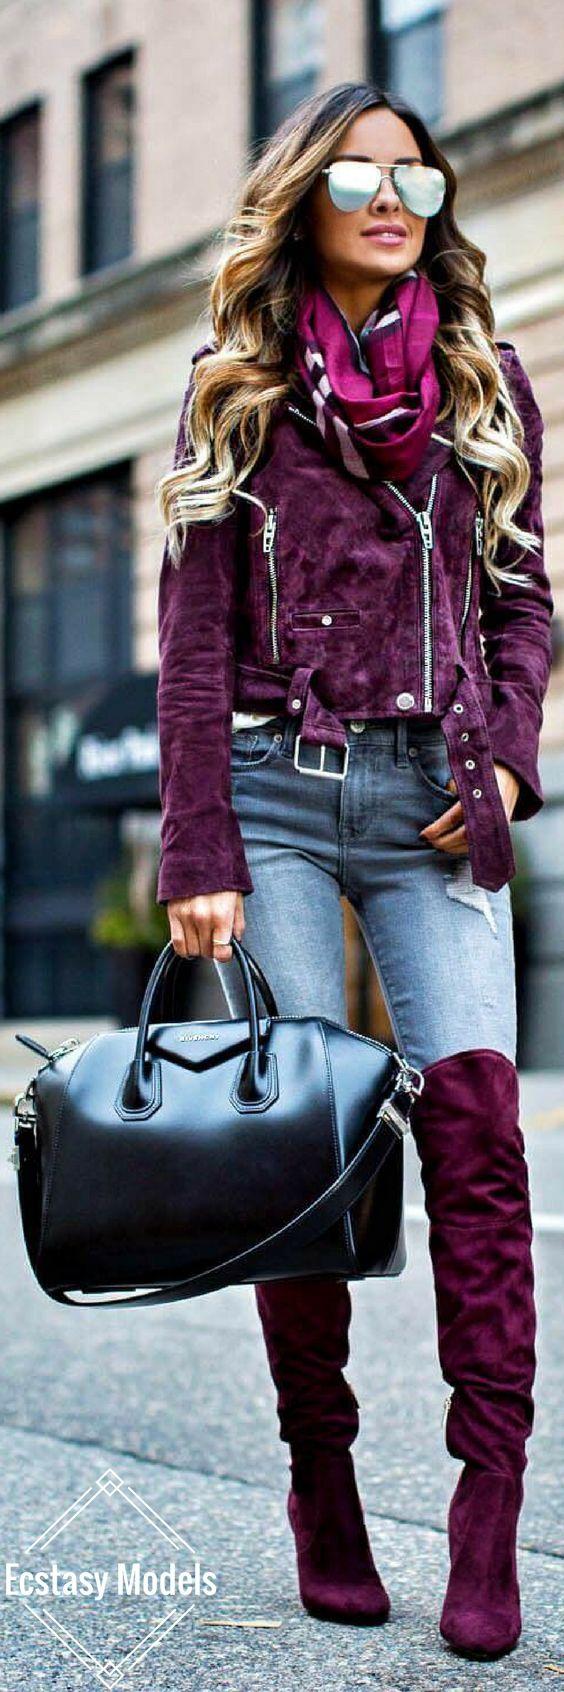 Fuchsia Pink // Fashion Look by Mia Mia Mine